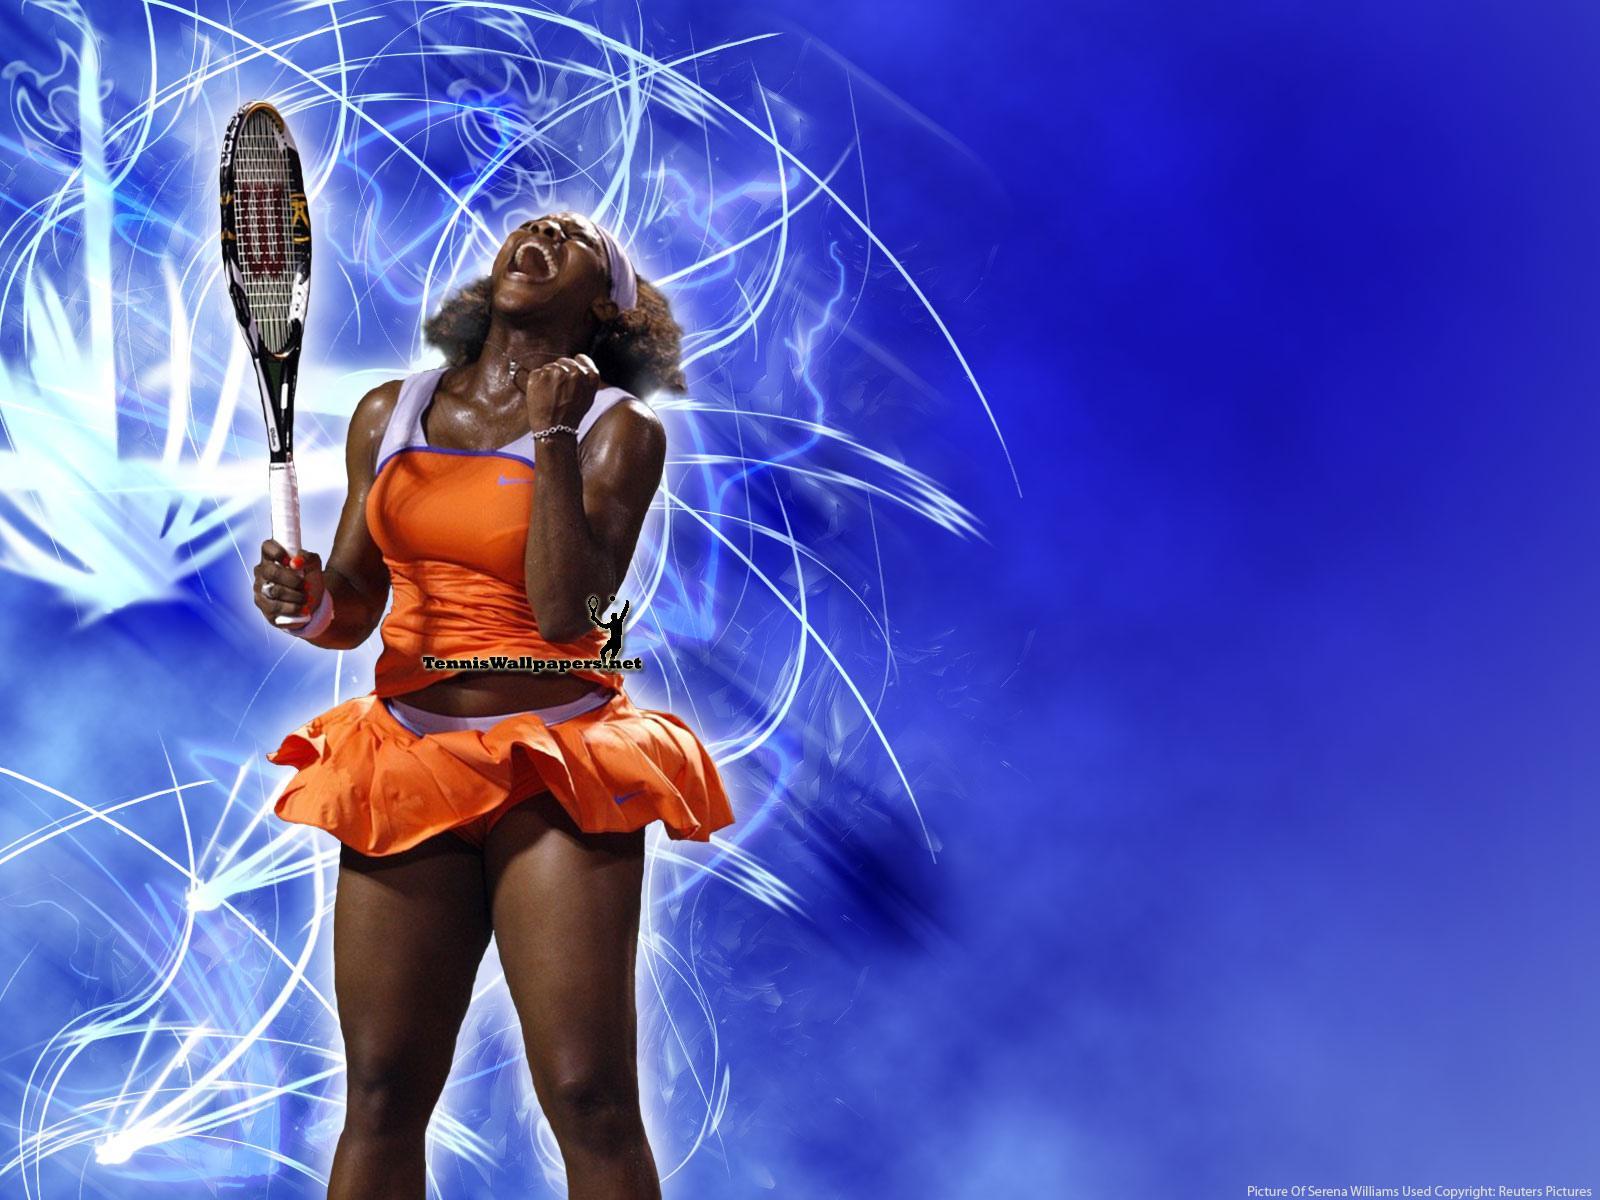 Serena Williams Wallpaper HD Download